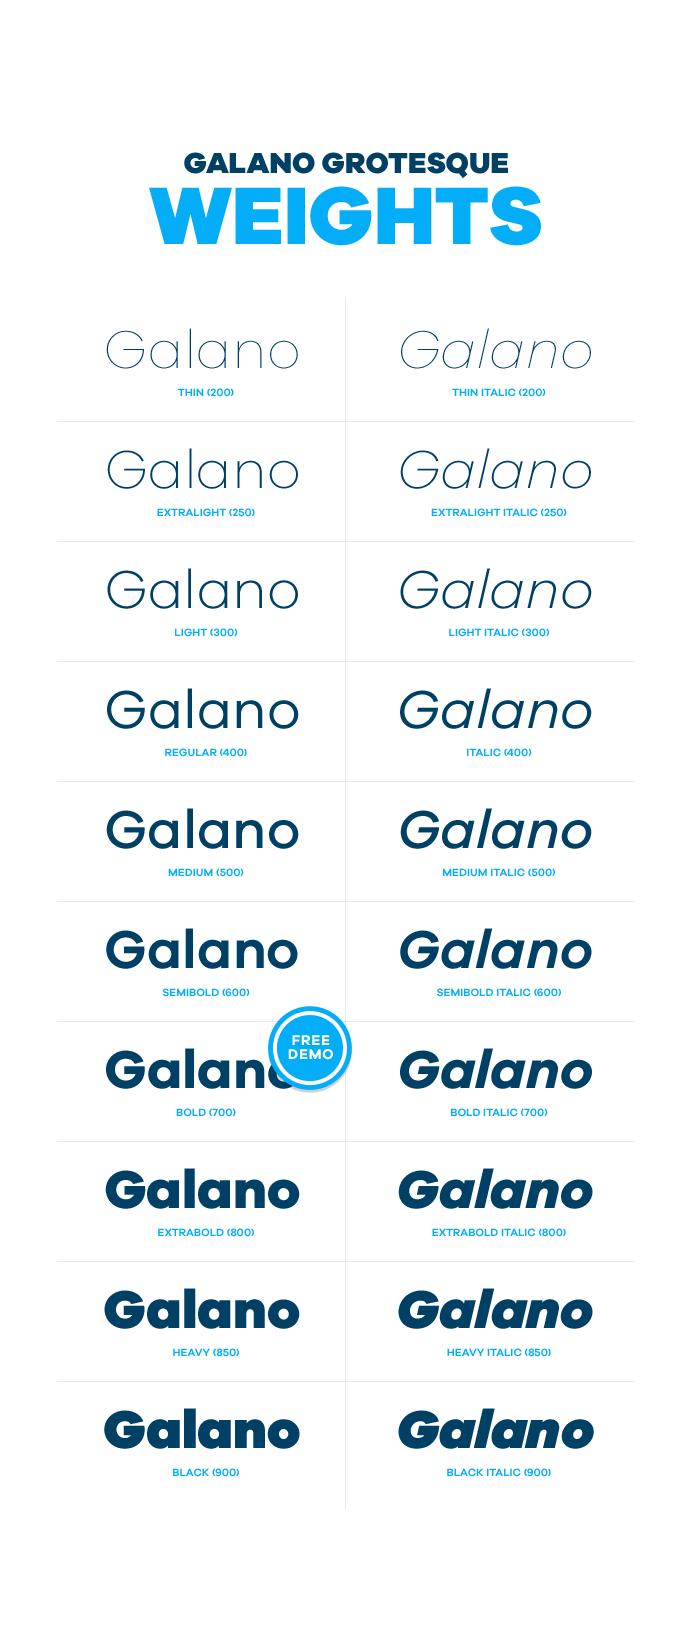 galano08